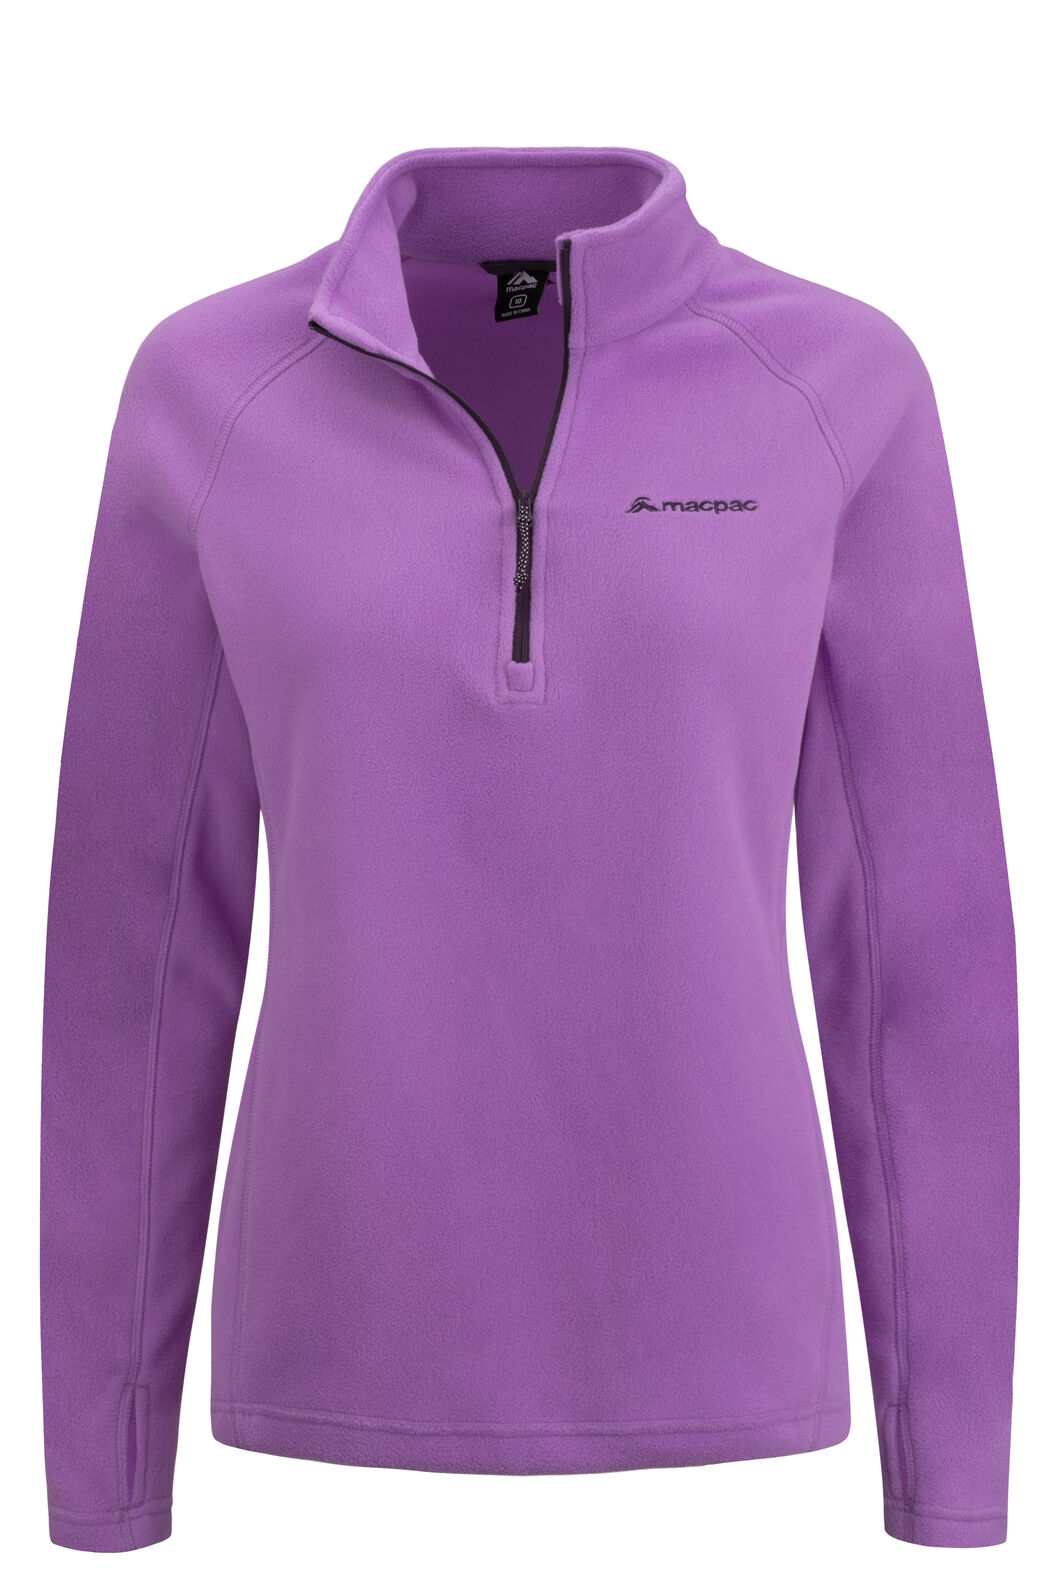 Macpac Women's Tui Polartec® Micro Fleece® Pullover, Hyacinth, hi-res